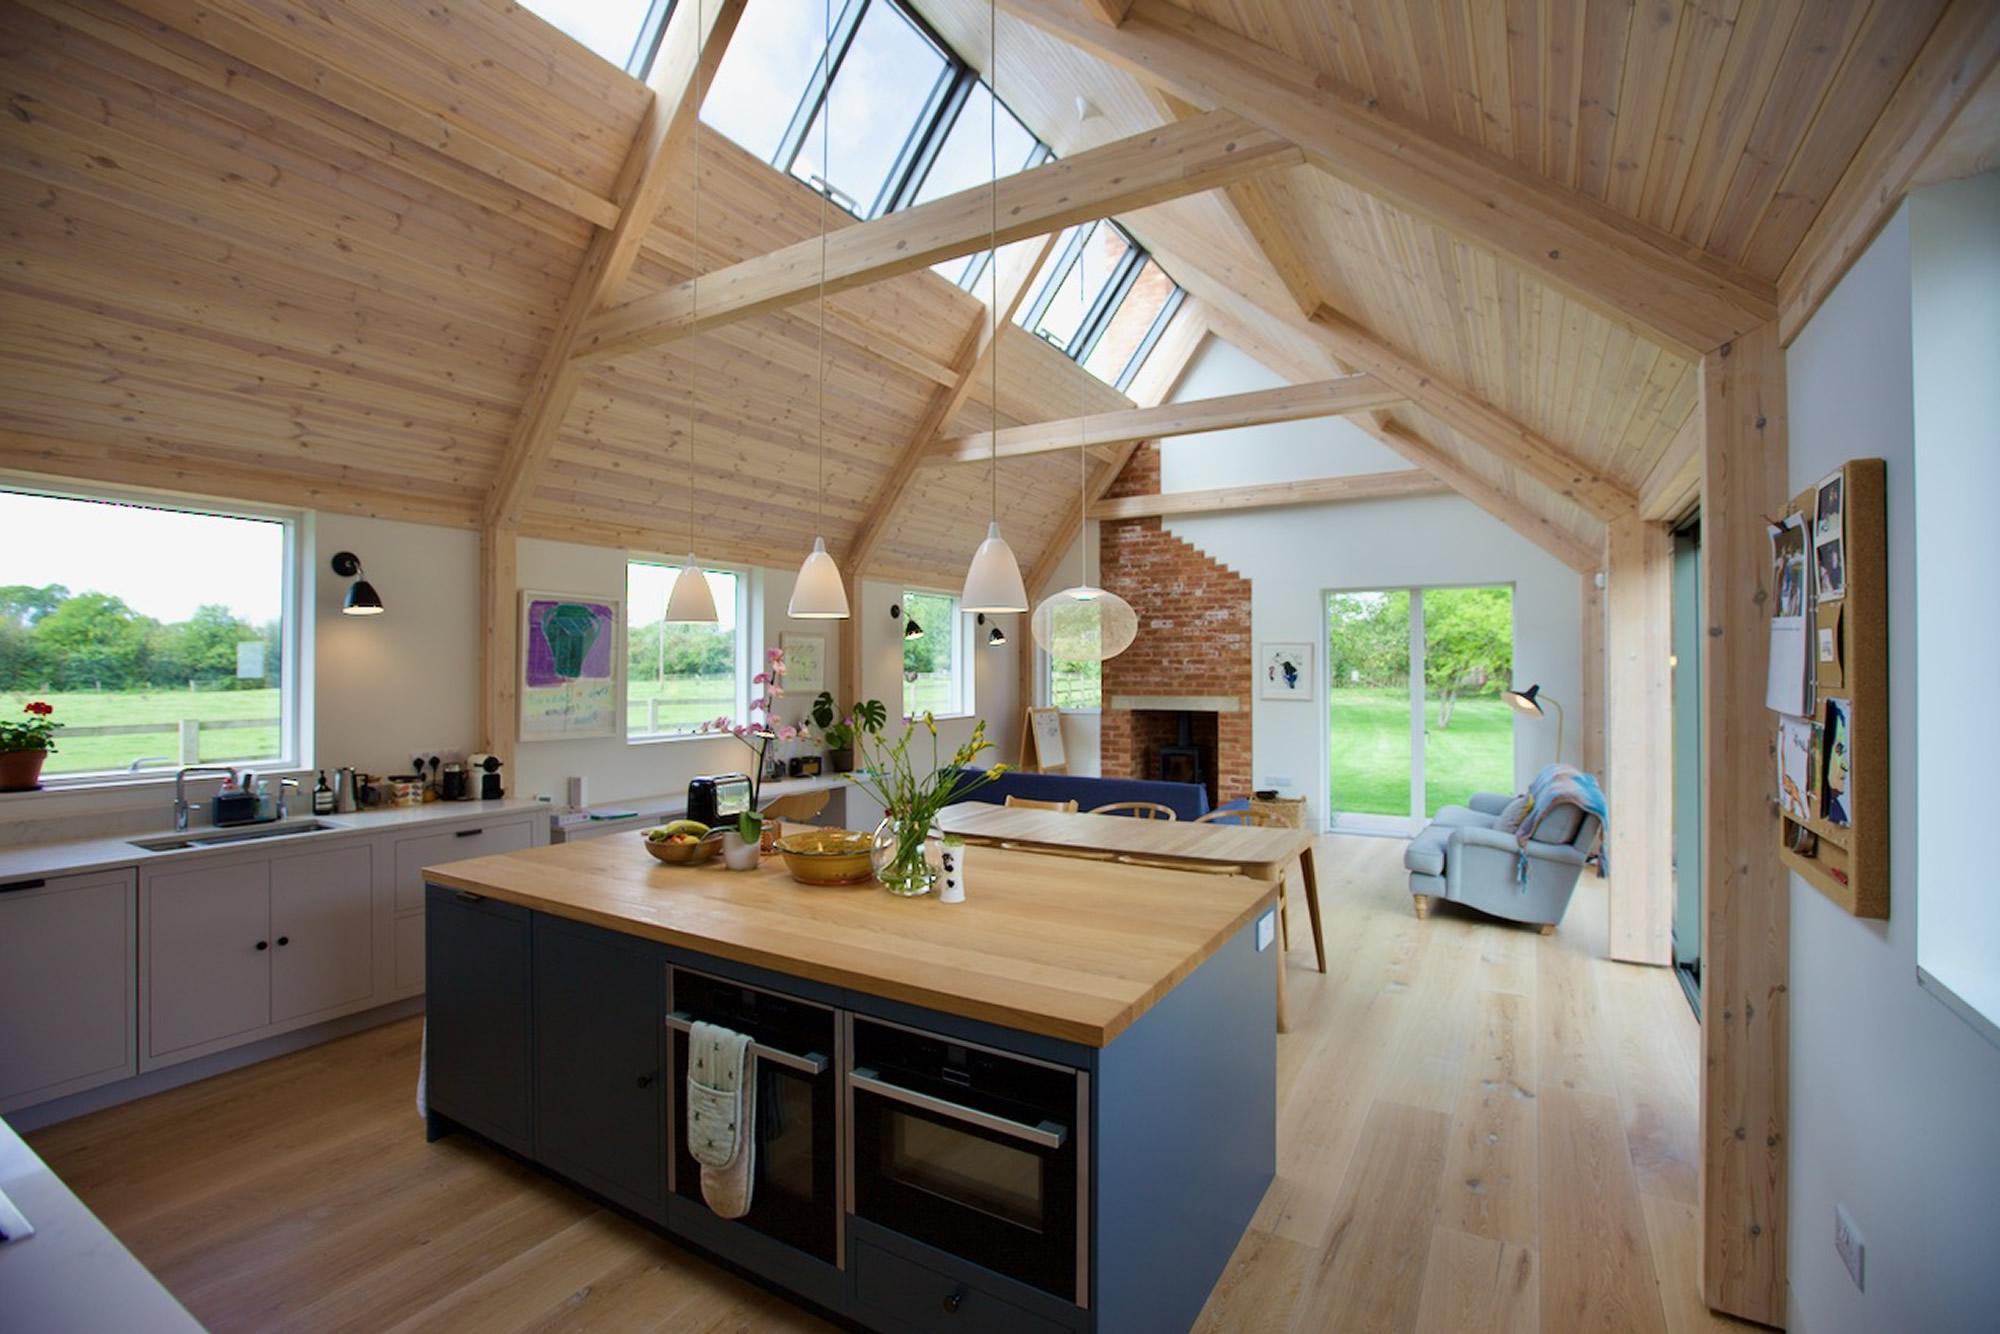 Emma Guy Architect - Magpies